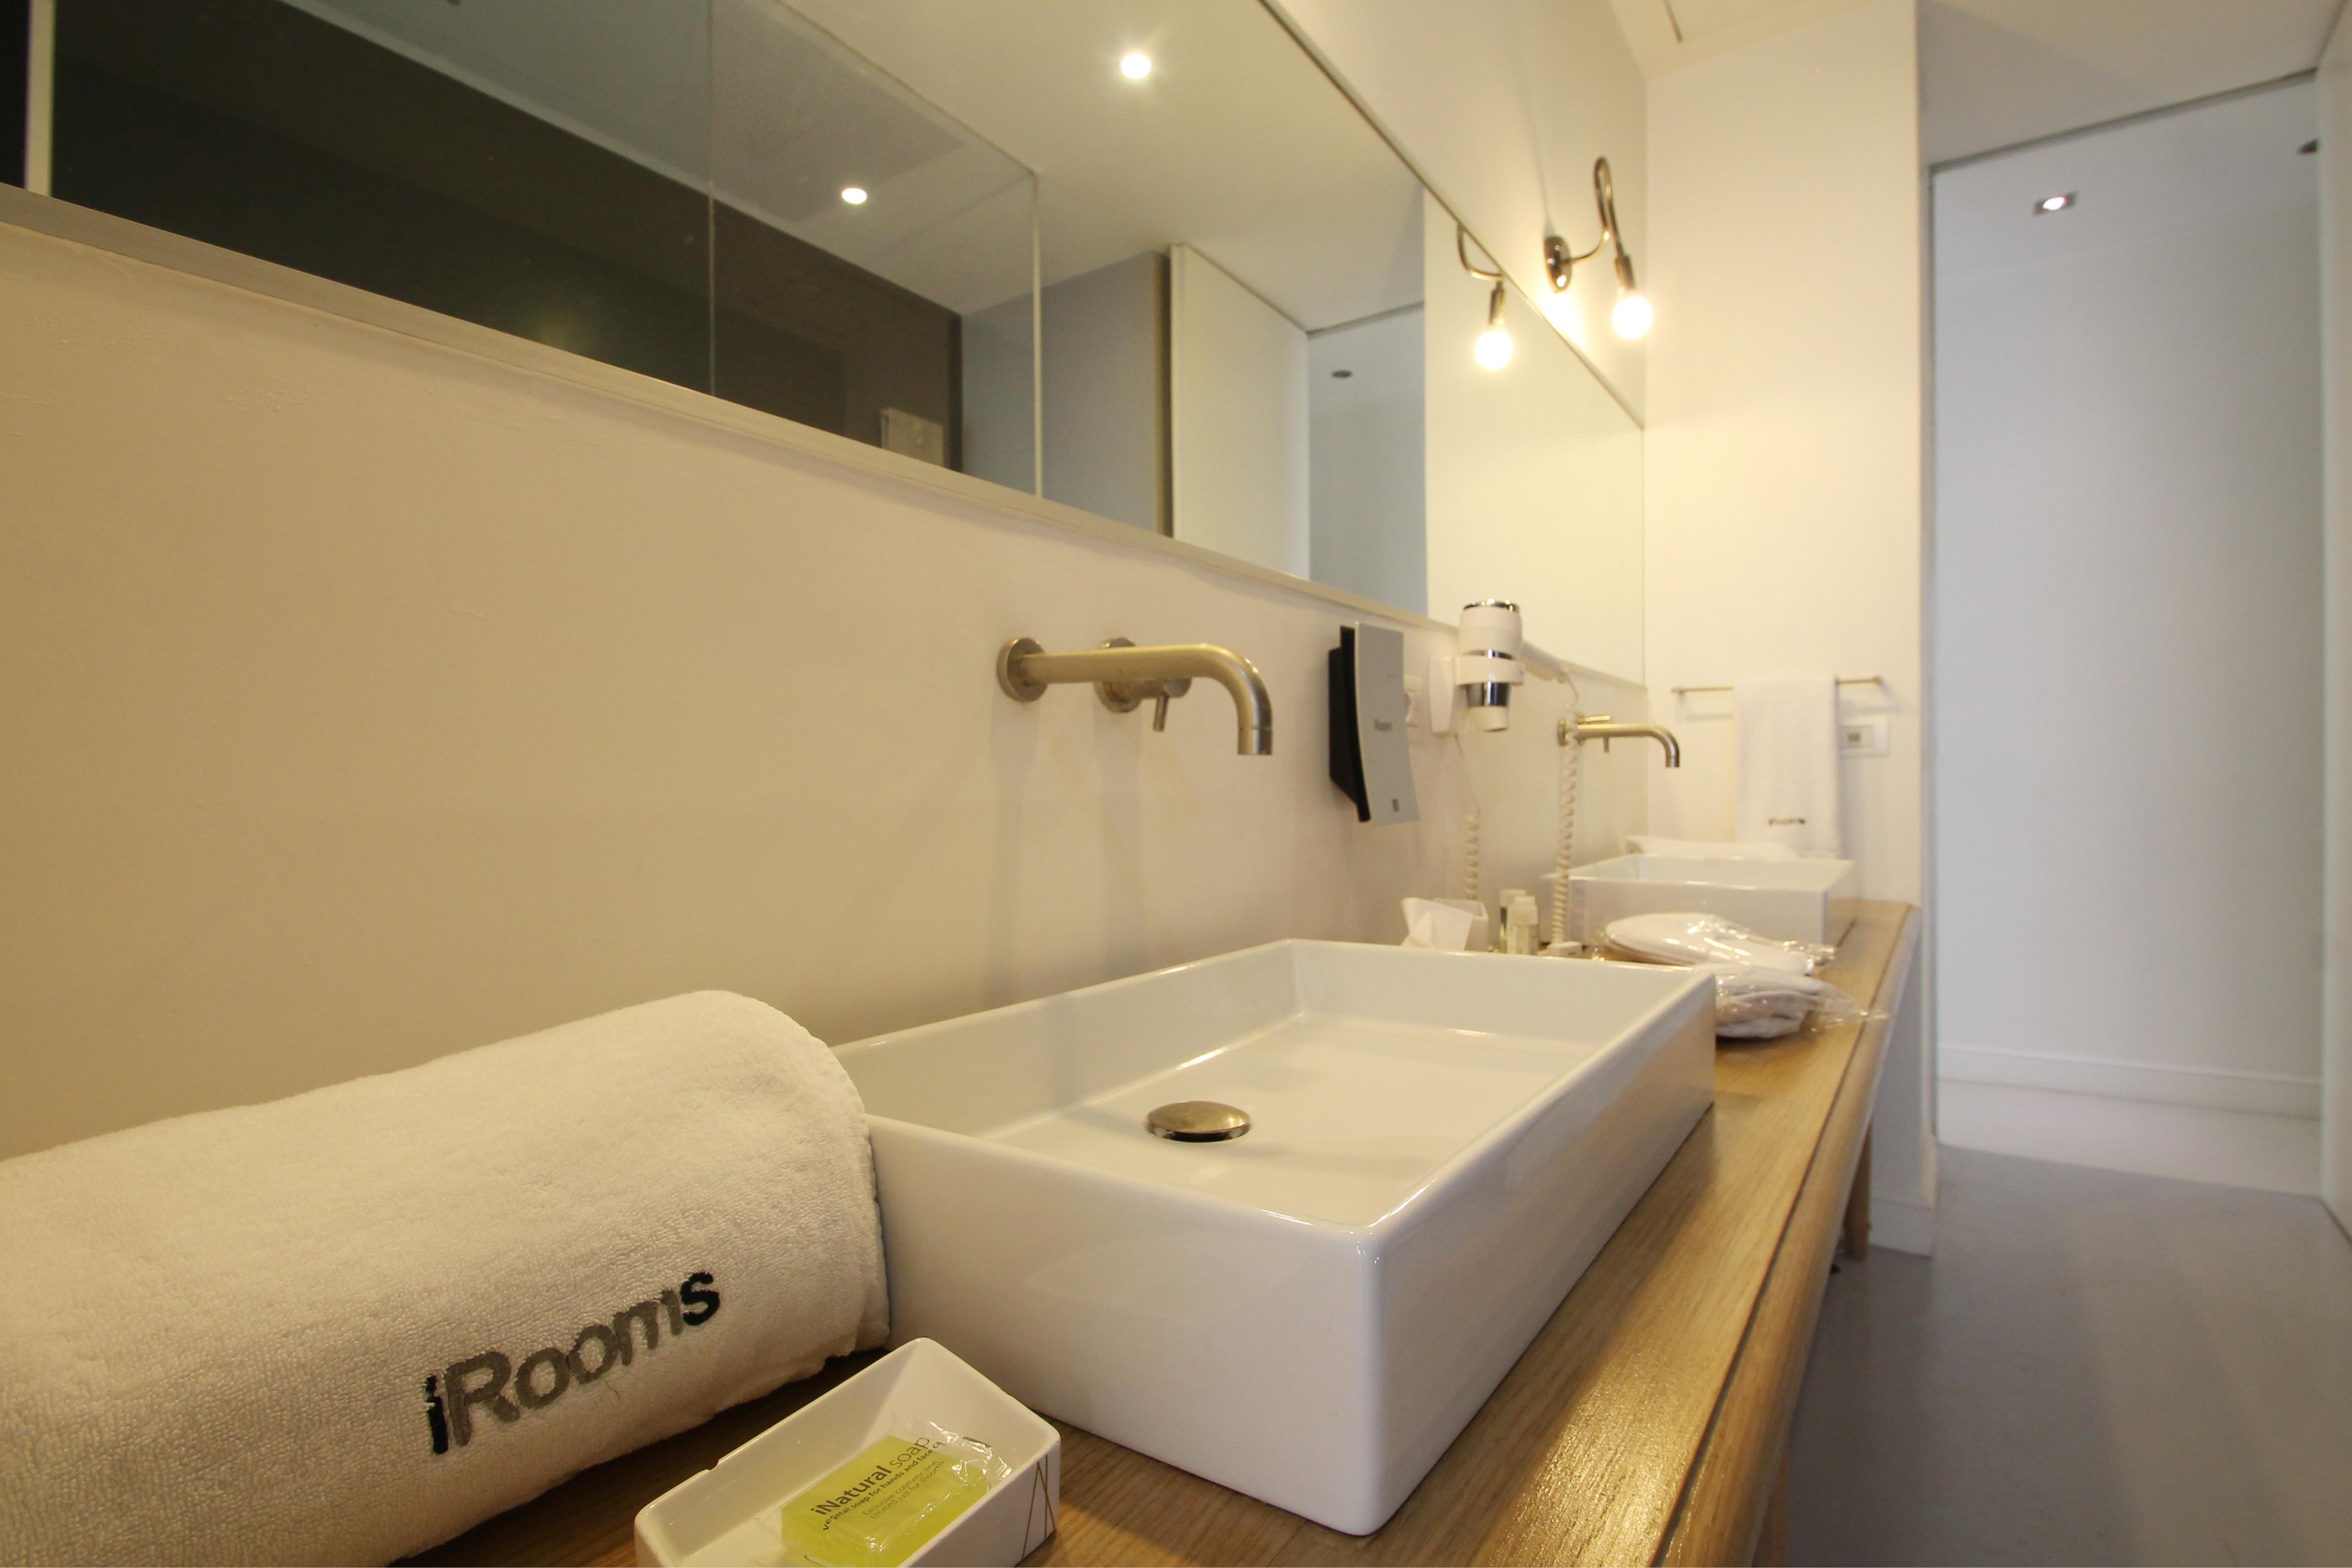 iSuite bathroom